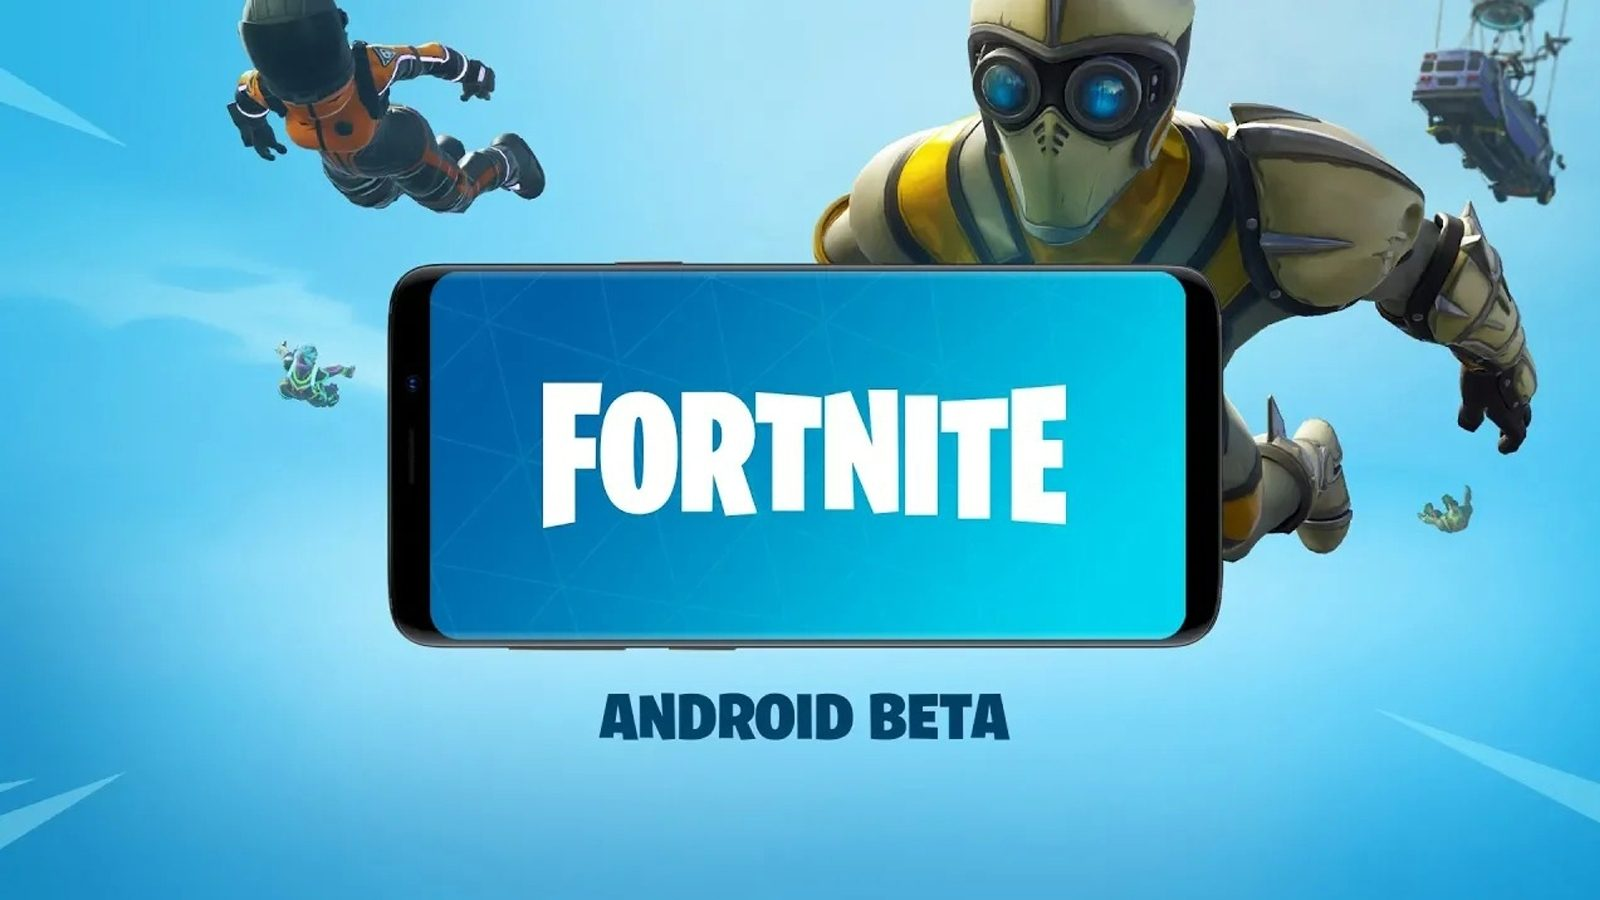 Fortnite android comment l'avoir